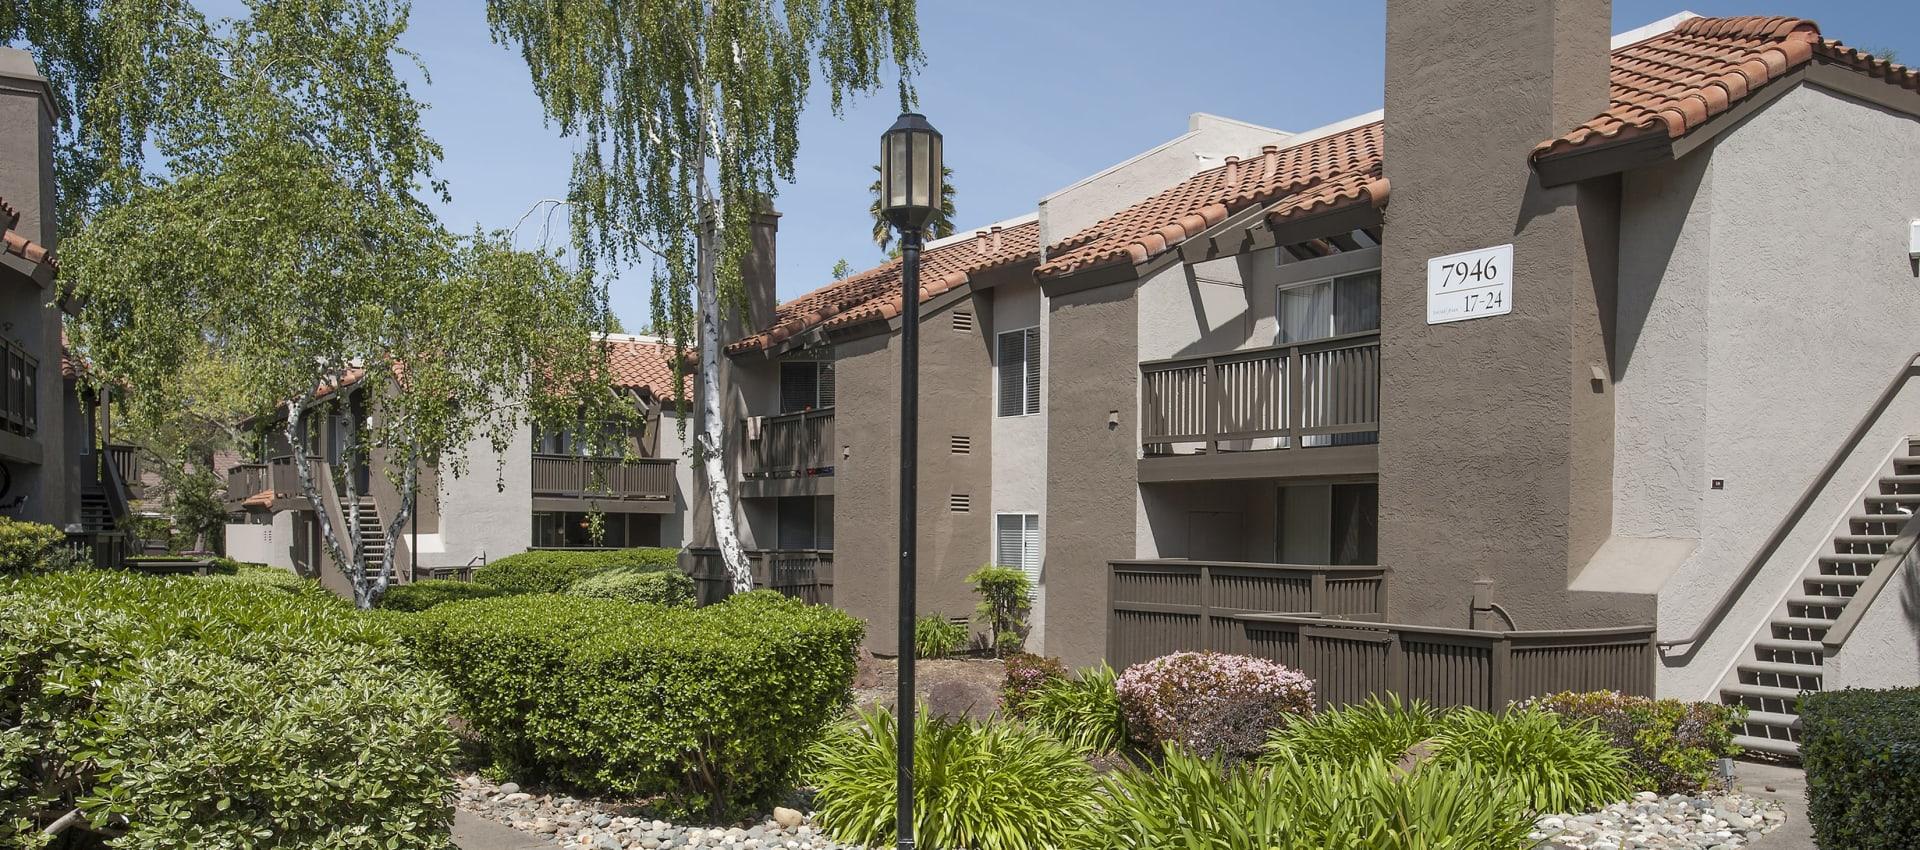 Private balcony or patio at Shore Park at Riverlake in Sacramento, California